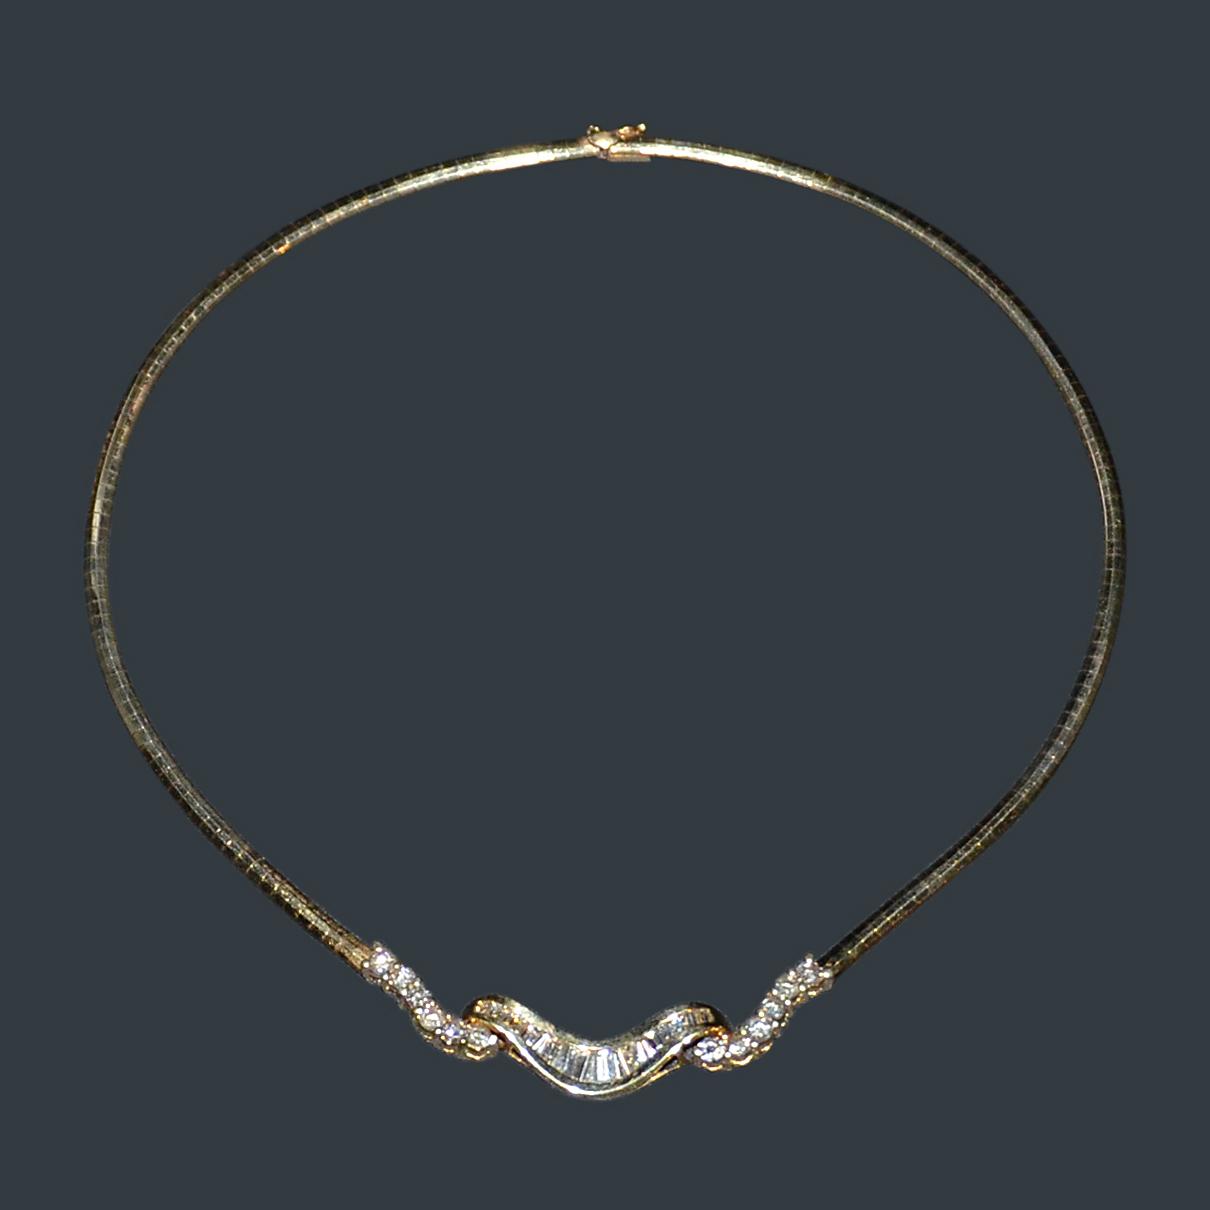 Lot 12 - 2.65 克拉鑽石項錬,鑲14K黃金 附美國寶石學院 AIG 鑒定證書 Yellow Gold Diamond Necklace 14 kt Yellow Gold 2.65ct Diamond